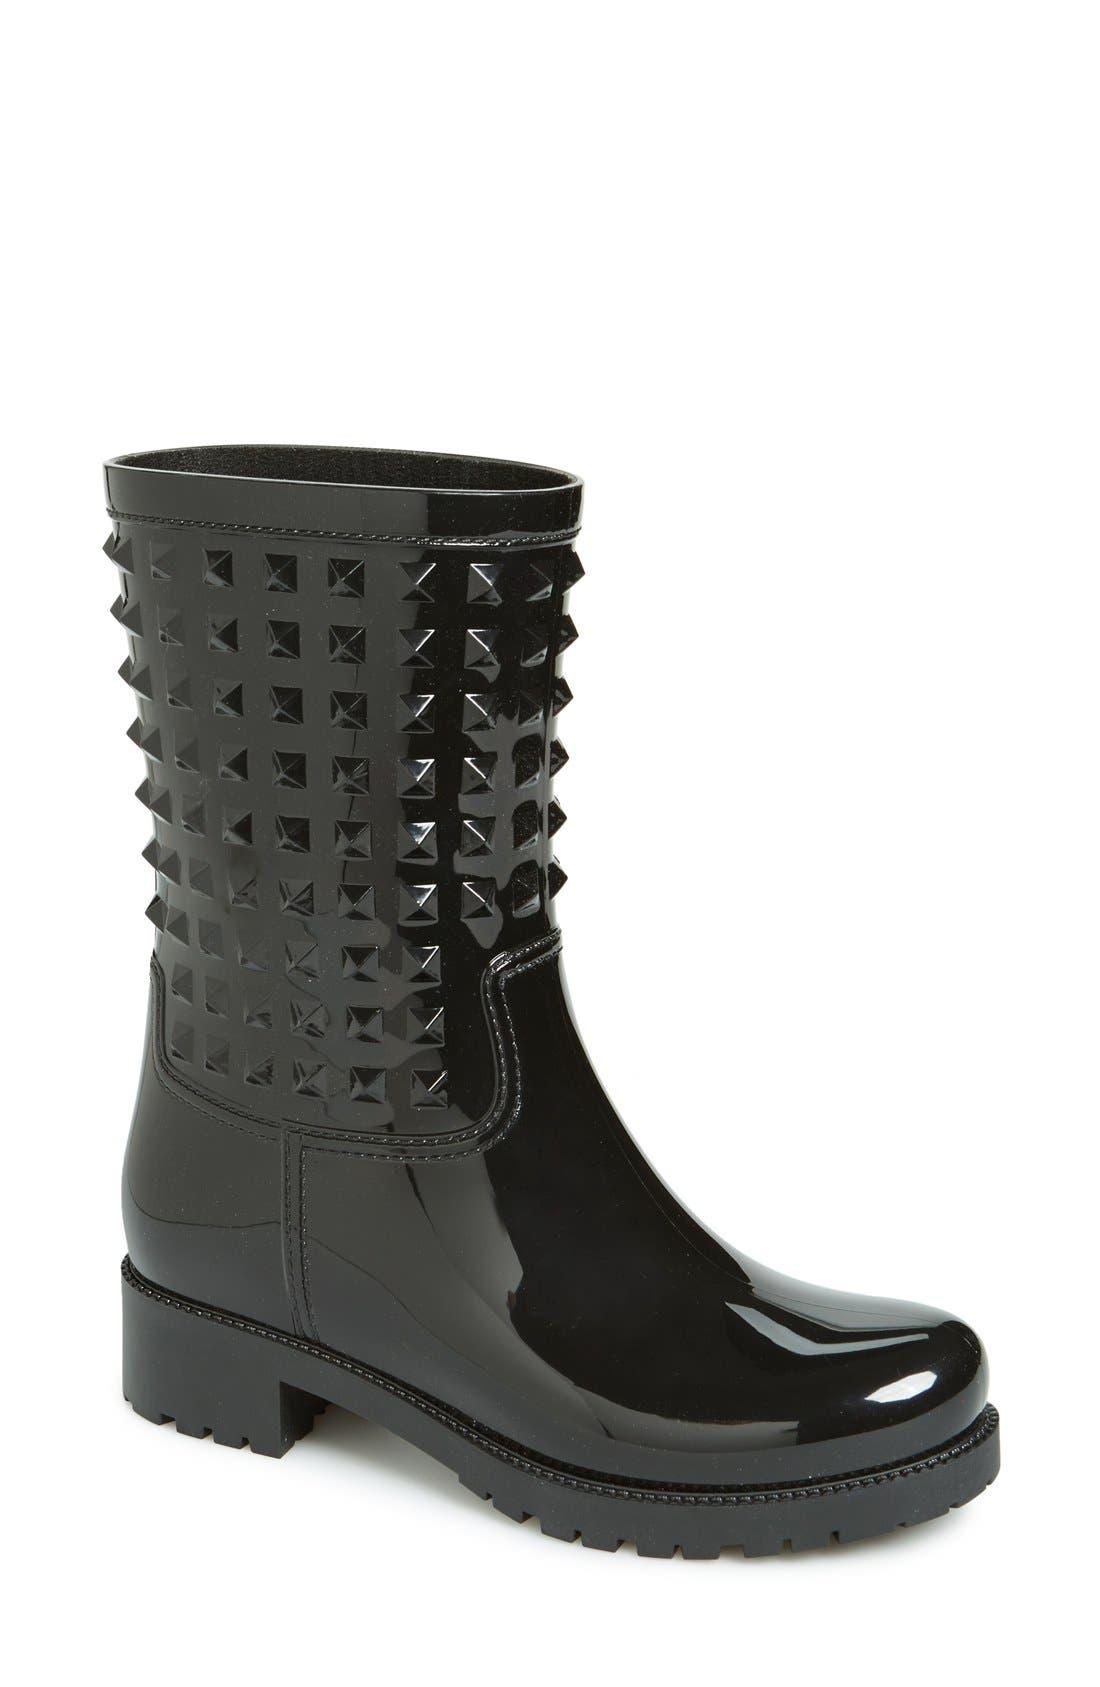 Main Image - Valentino 'Rockstud' Rain Boot (Women)